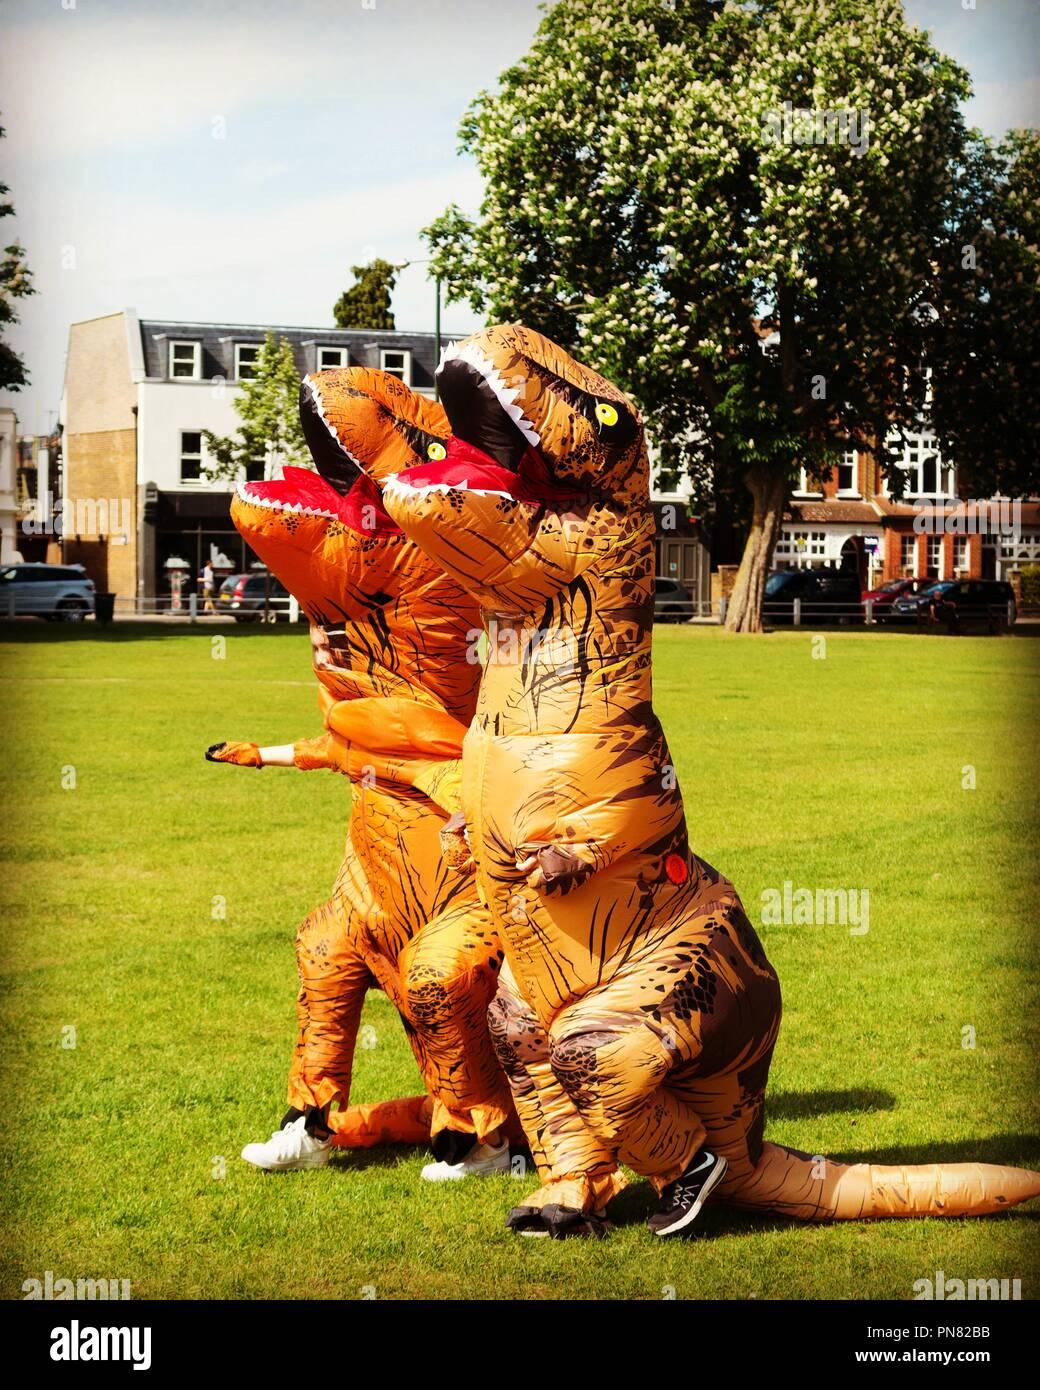 Two people wearing inflatable dinosaur costumes ( T Rex ) for fancy dress walk across Twickenham Green, UK - Stock Image